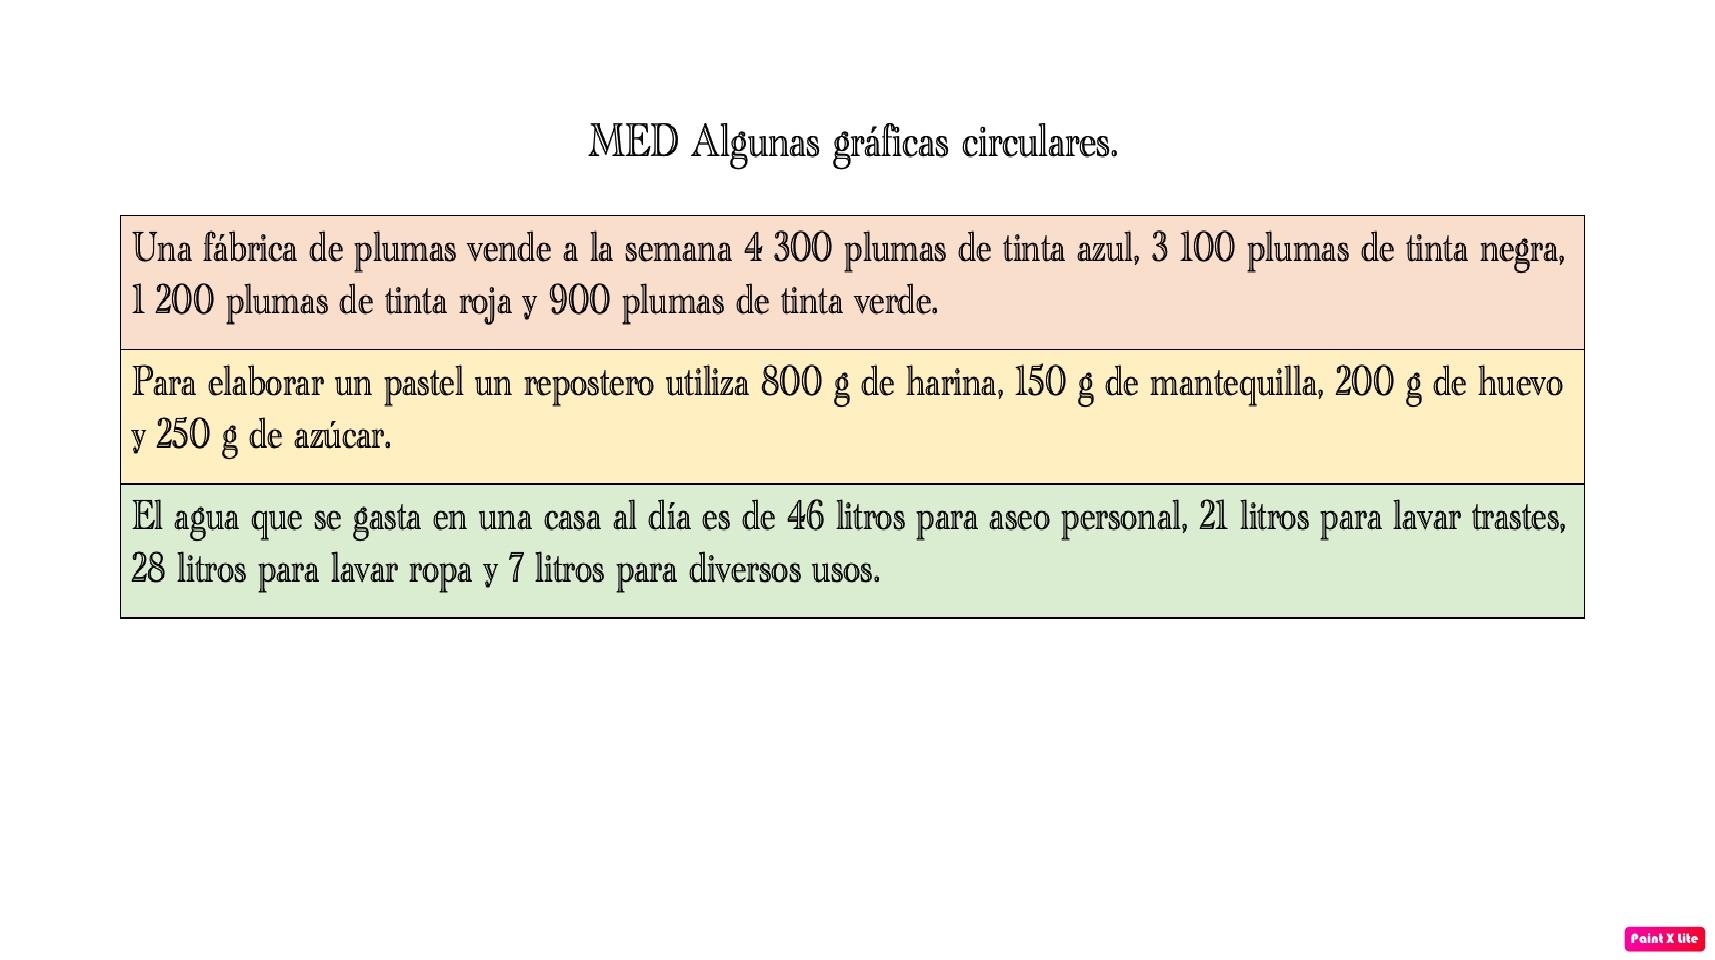 9540212652380608T1942021111222_Algunas+gra%CC%81ficas+circulares.jpg